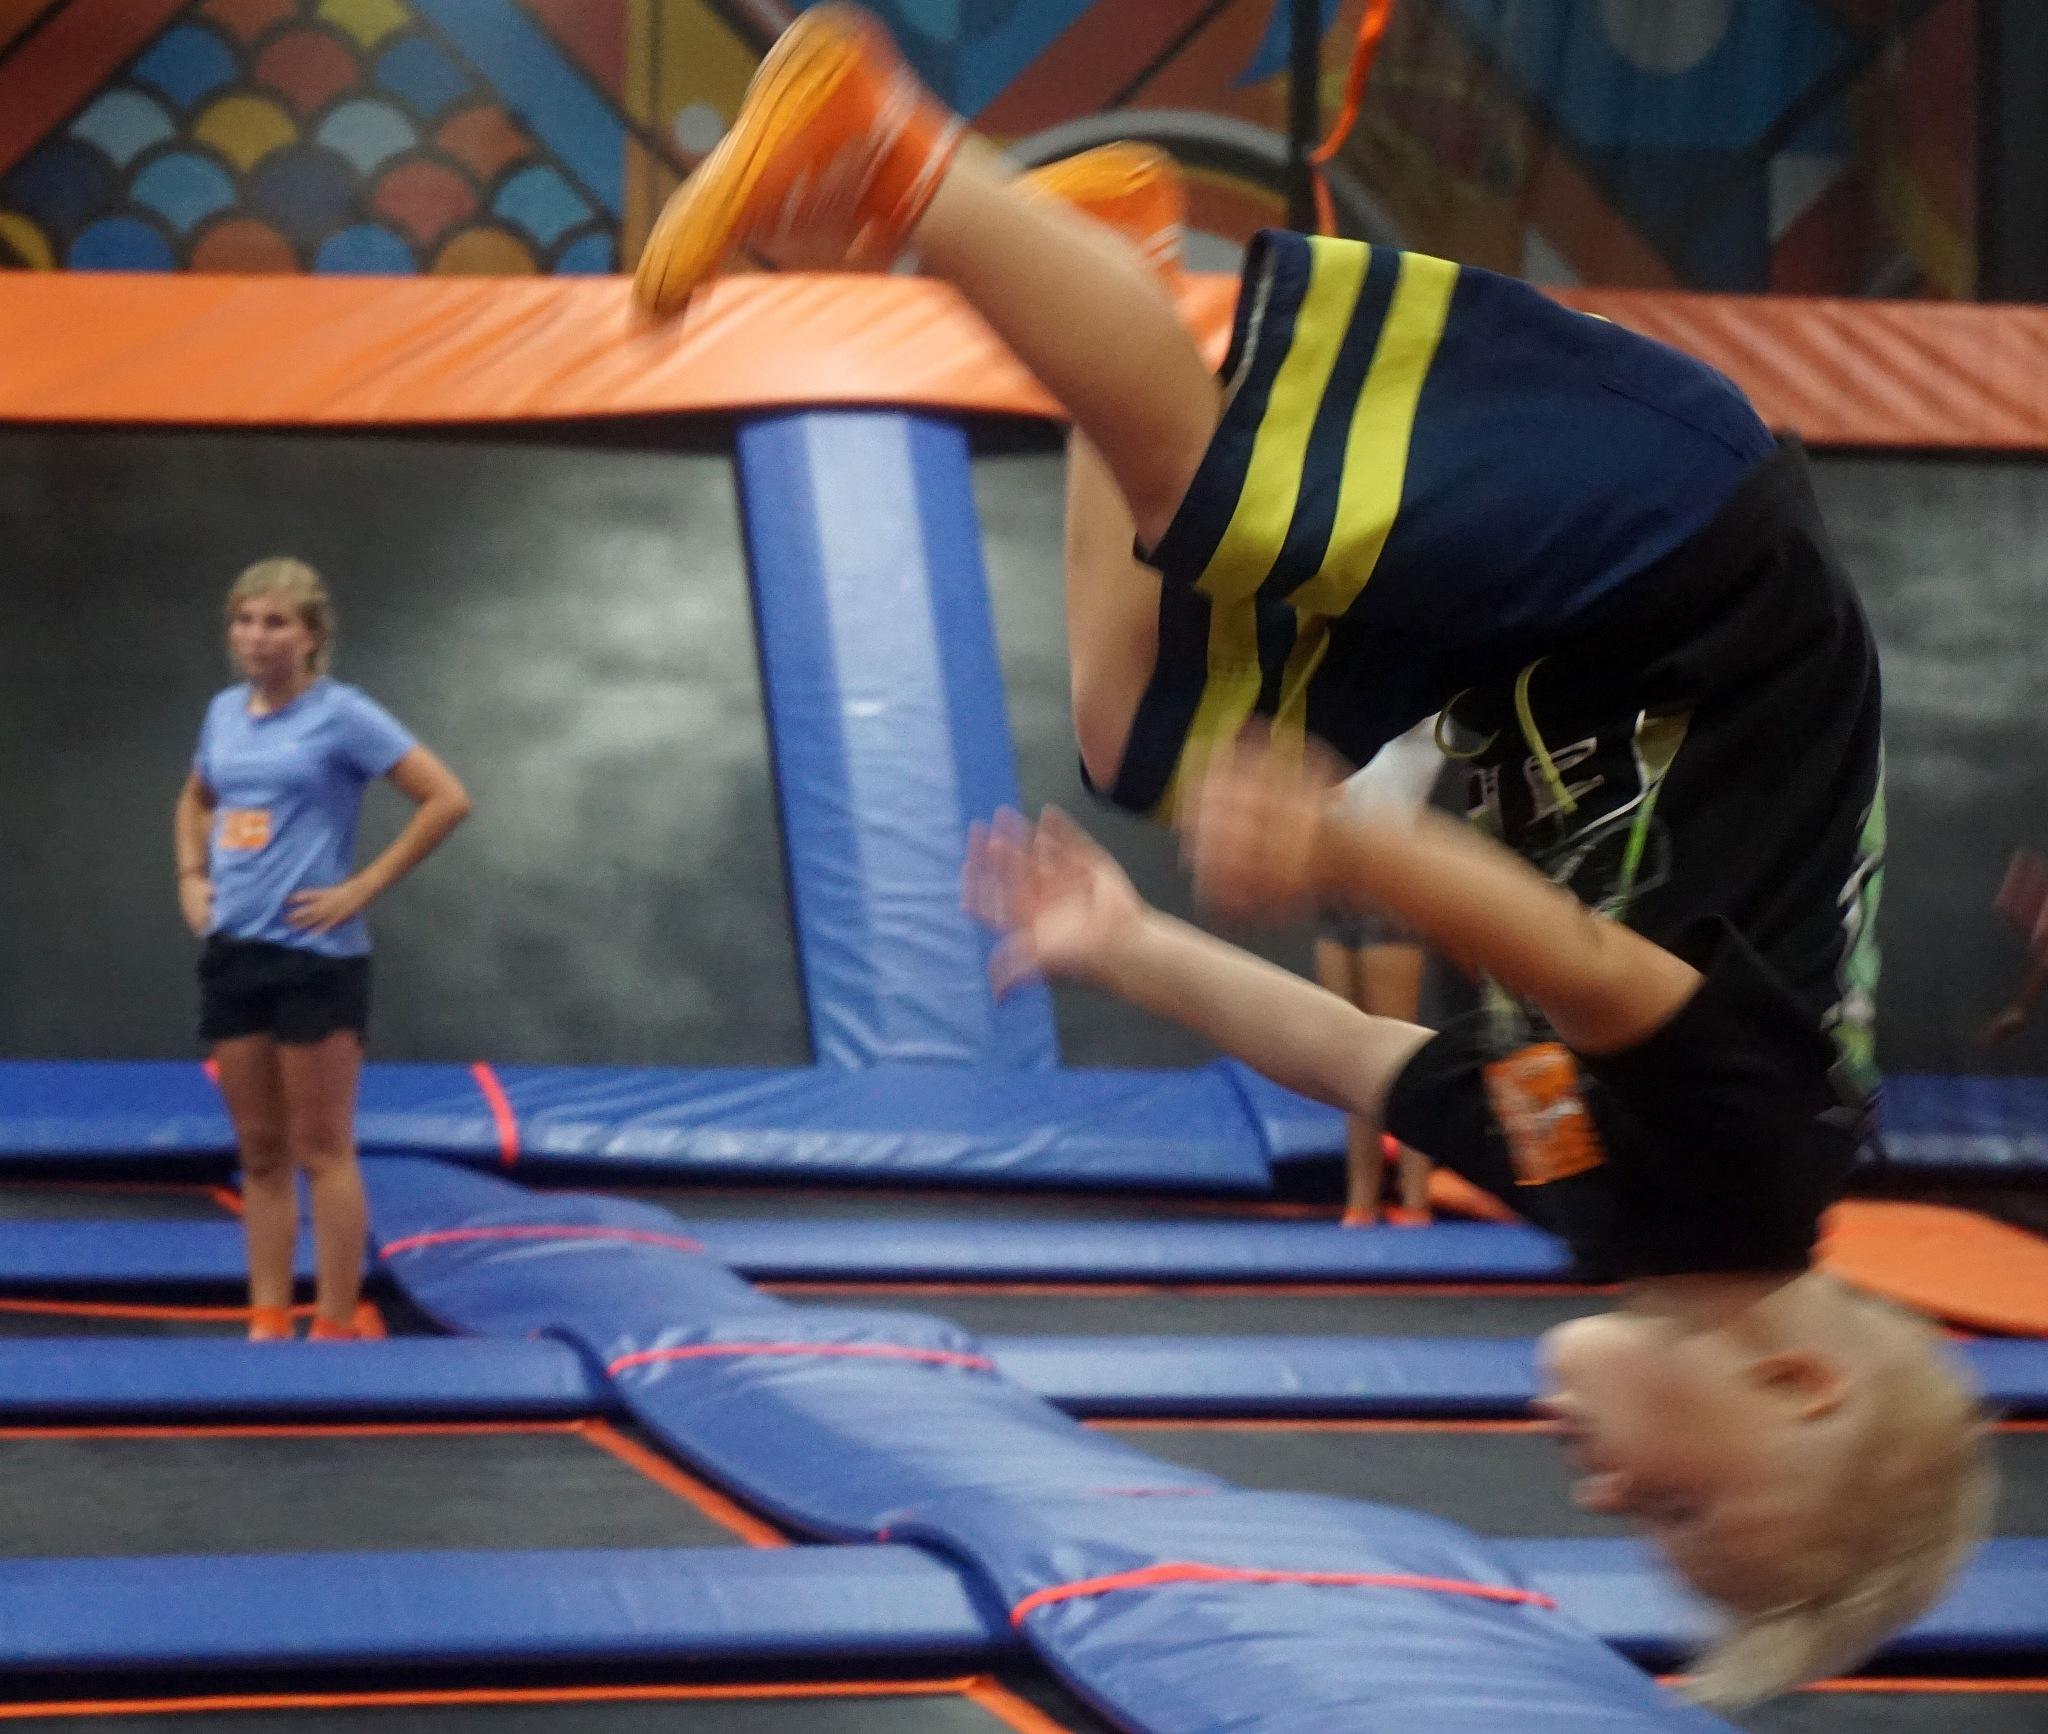 super bounce by Jamie Lazenby